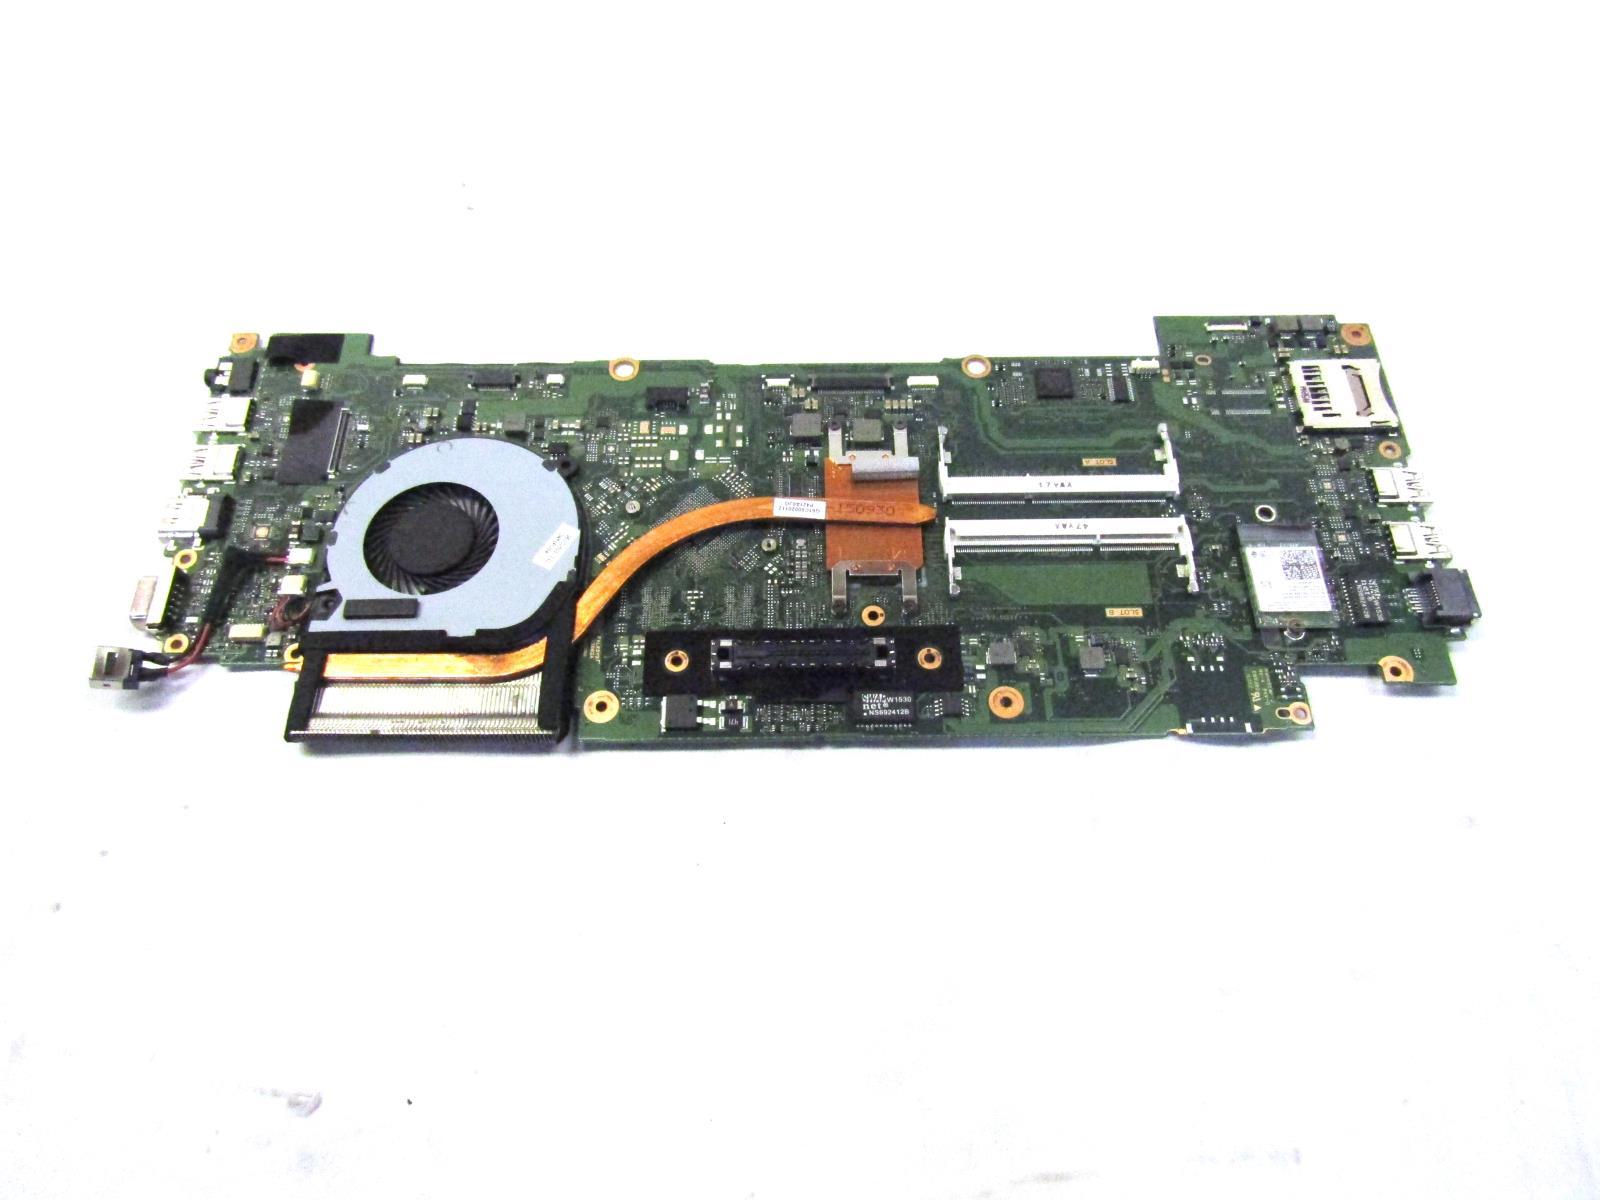 Toshiba Tecra Z50 Intel i7 Motherboard FALXSY2 SR1EA